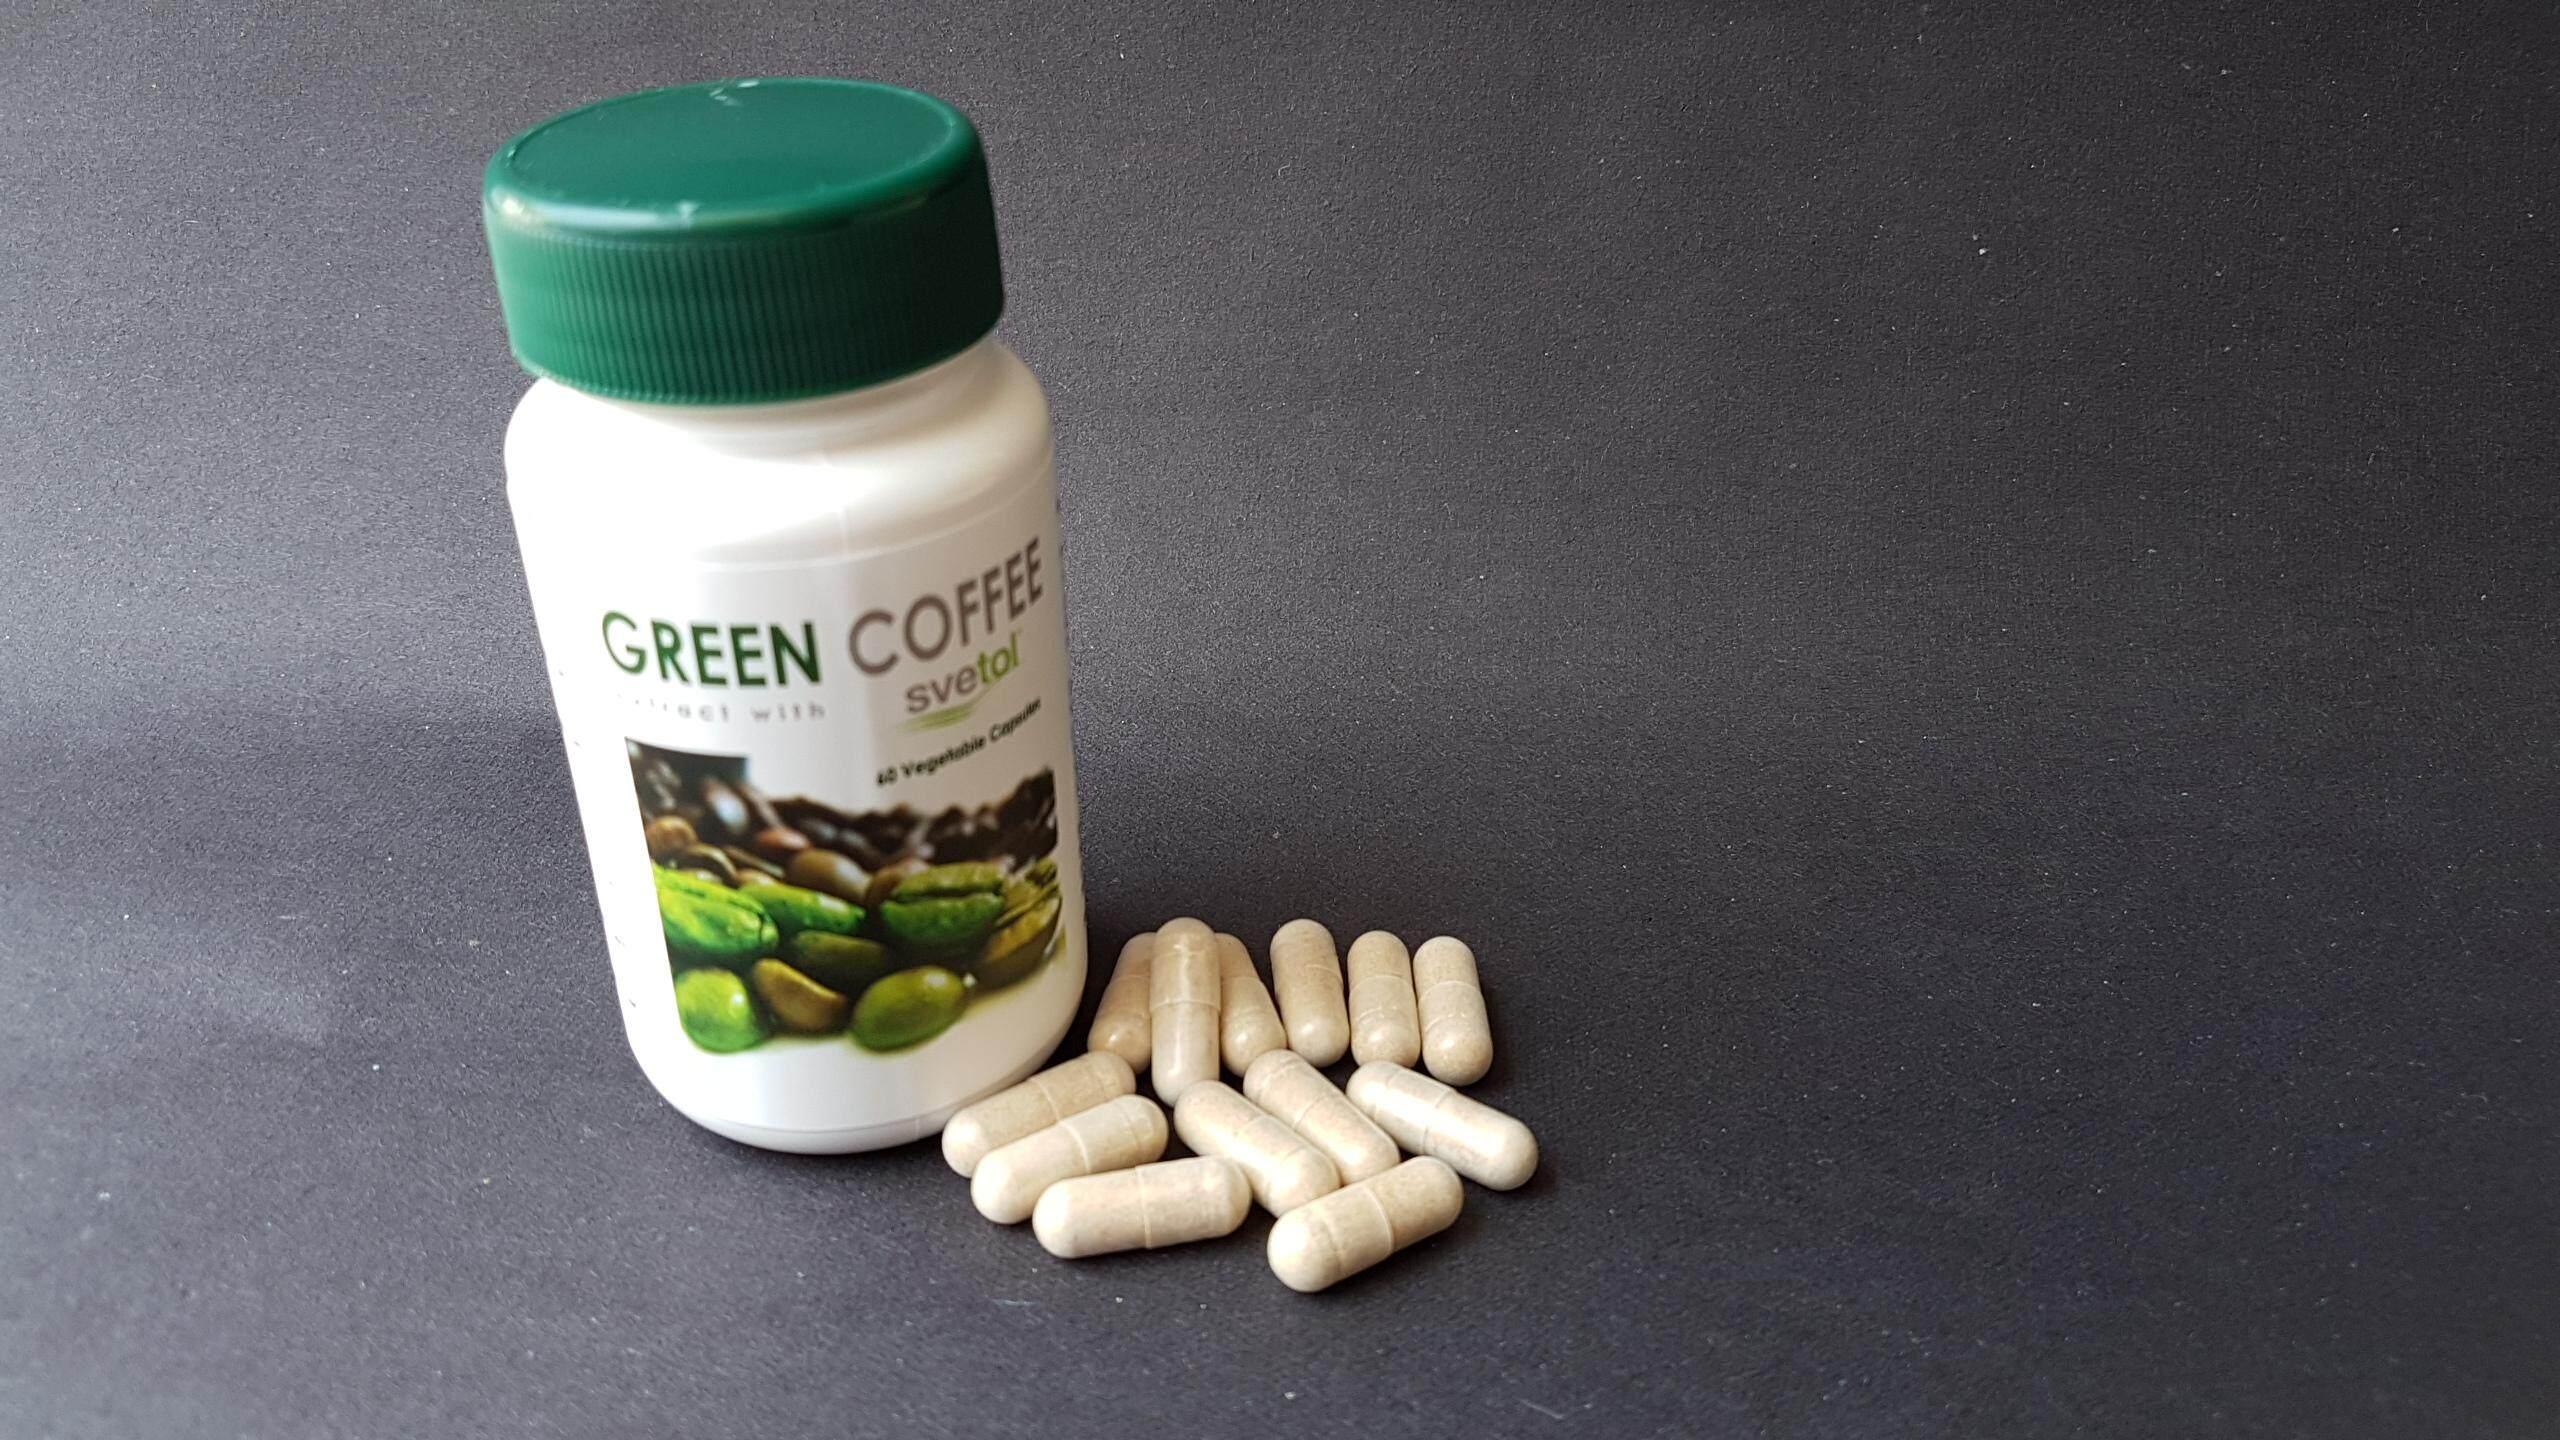 H2o diet pills image 2